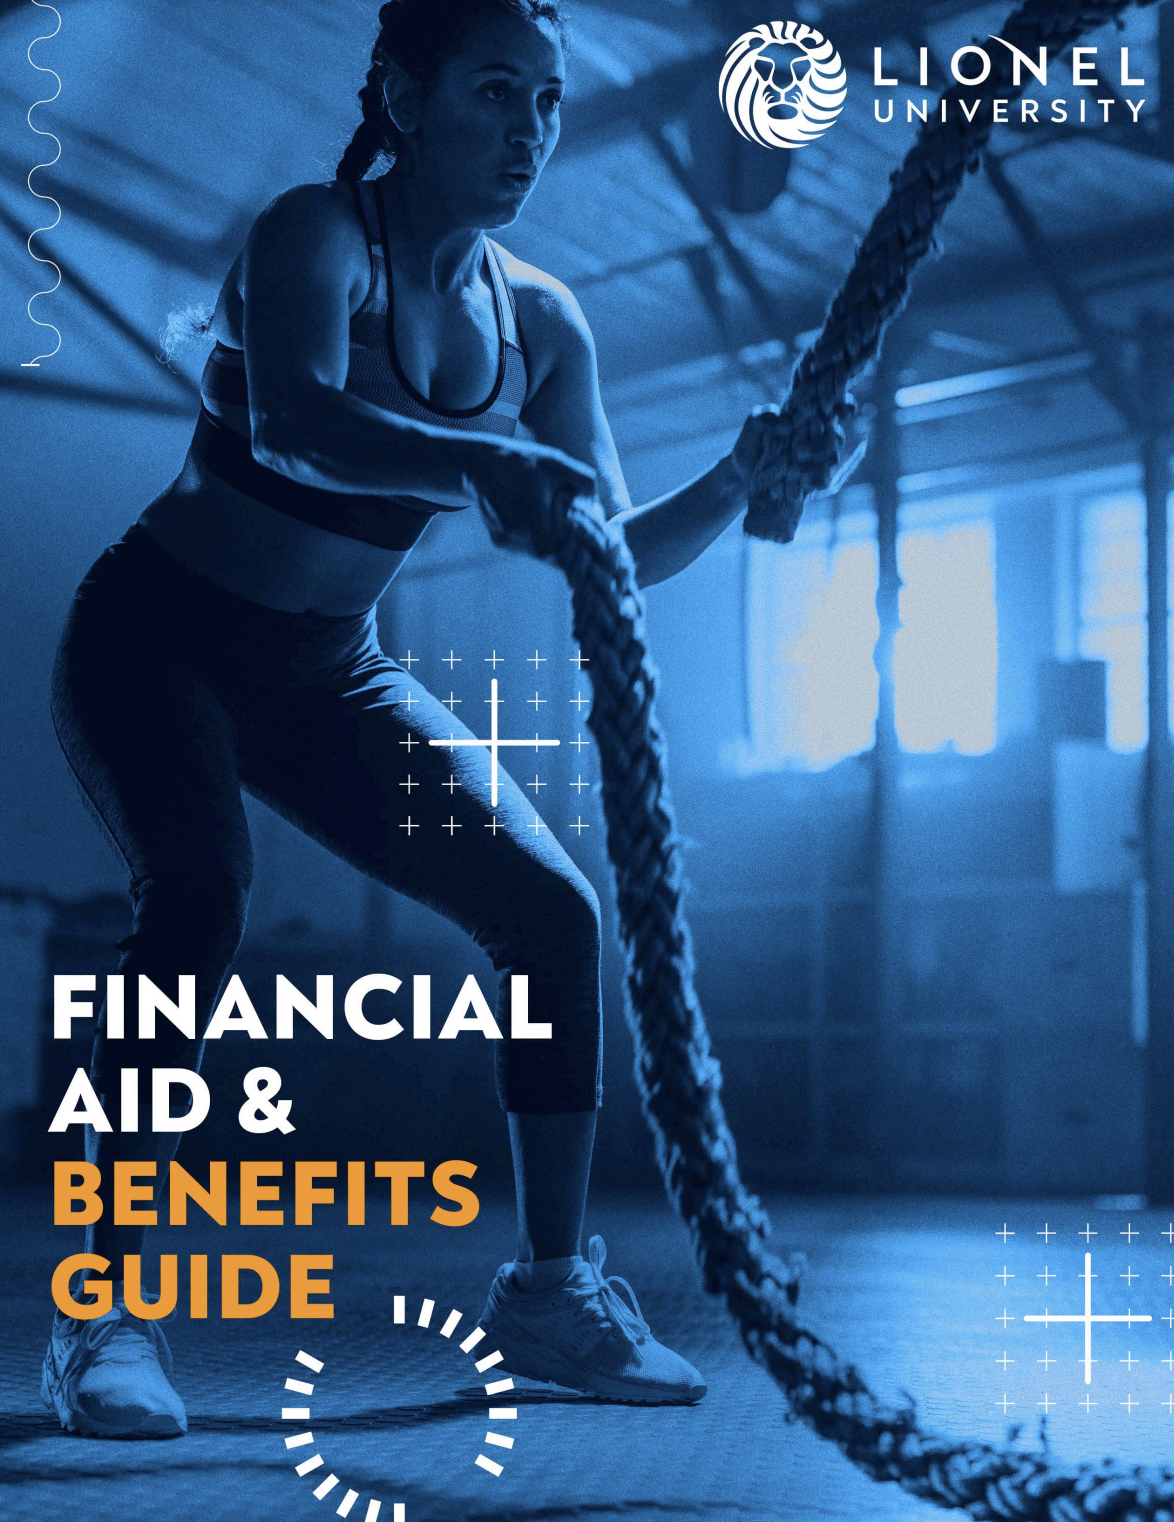 Lionel-aid-guide-cover